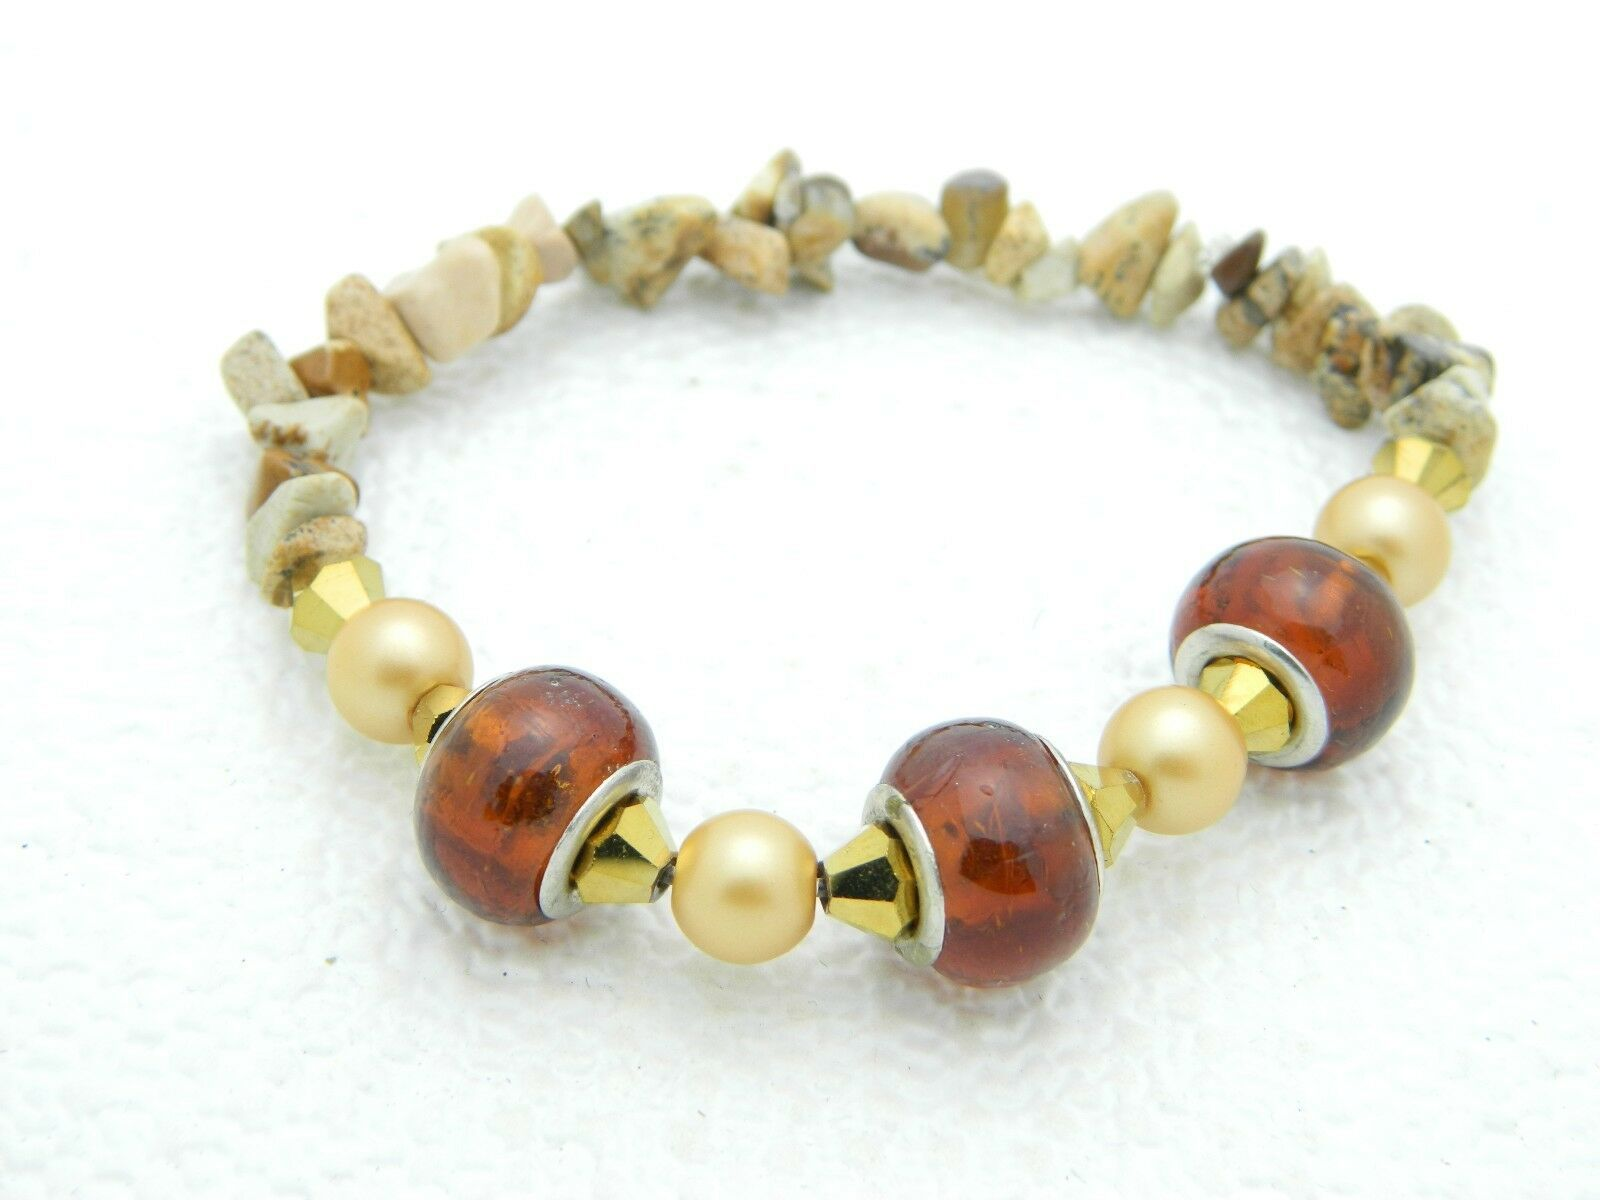 VTG Polished Stone Faux Amber Gold Tone Bead Stretch Bracelet